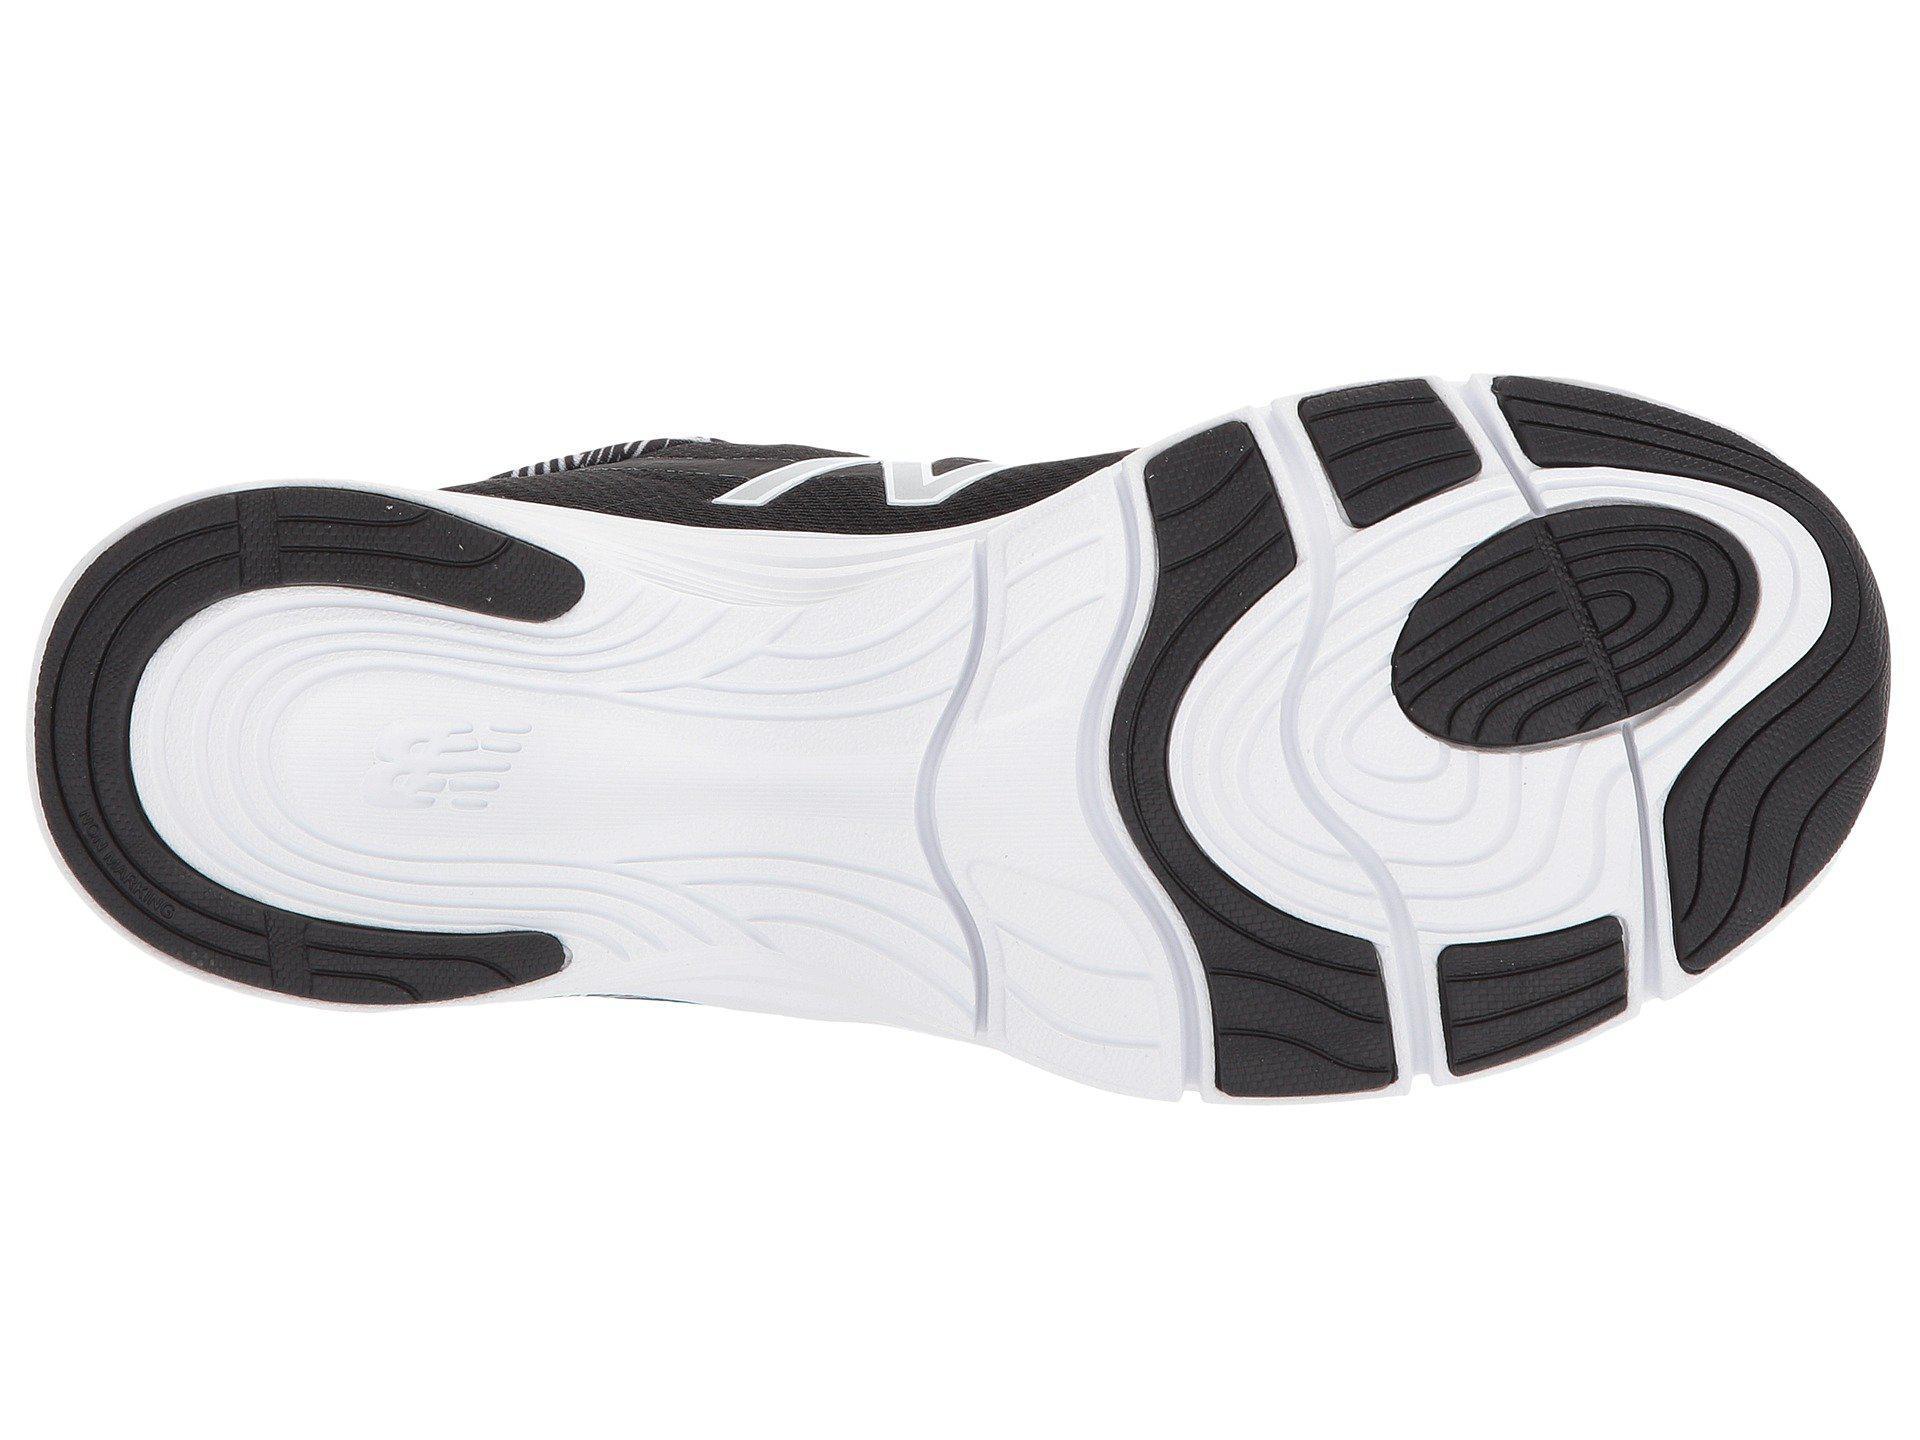 711v3 Cush + Cross-trainer-shoes